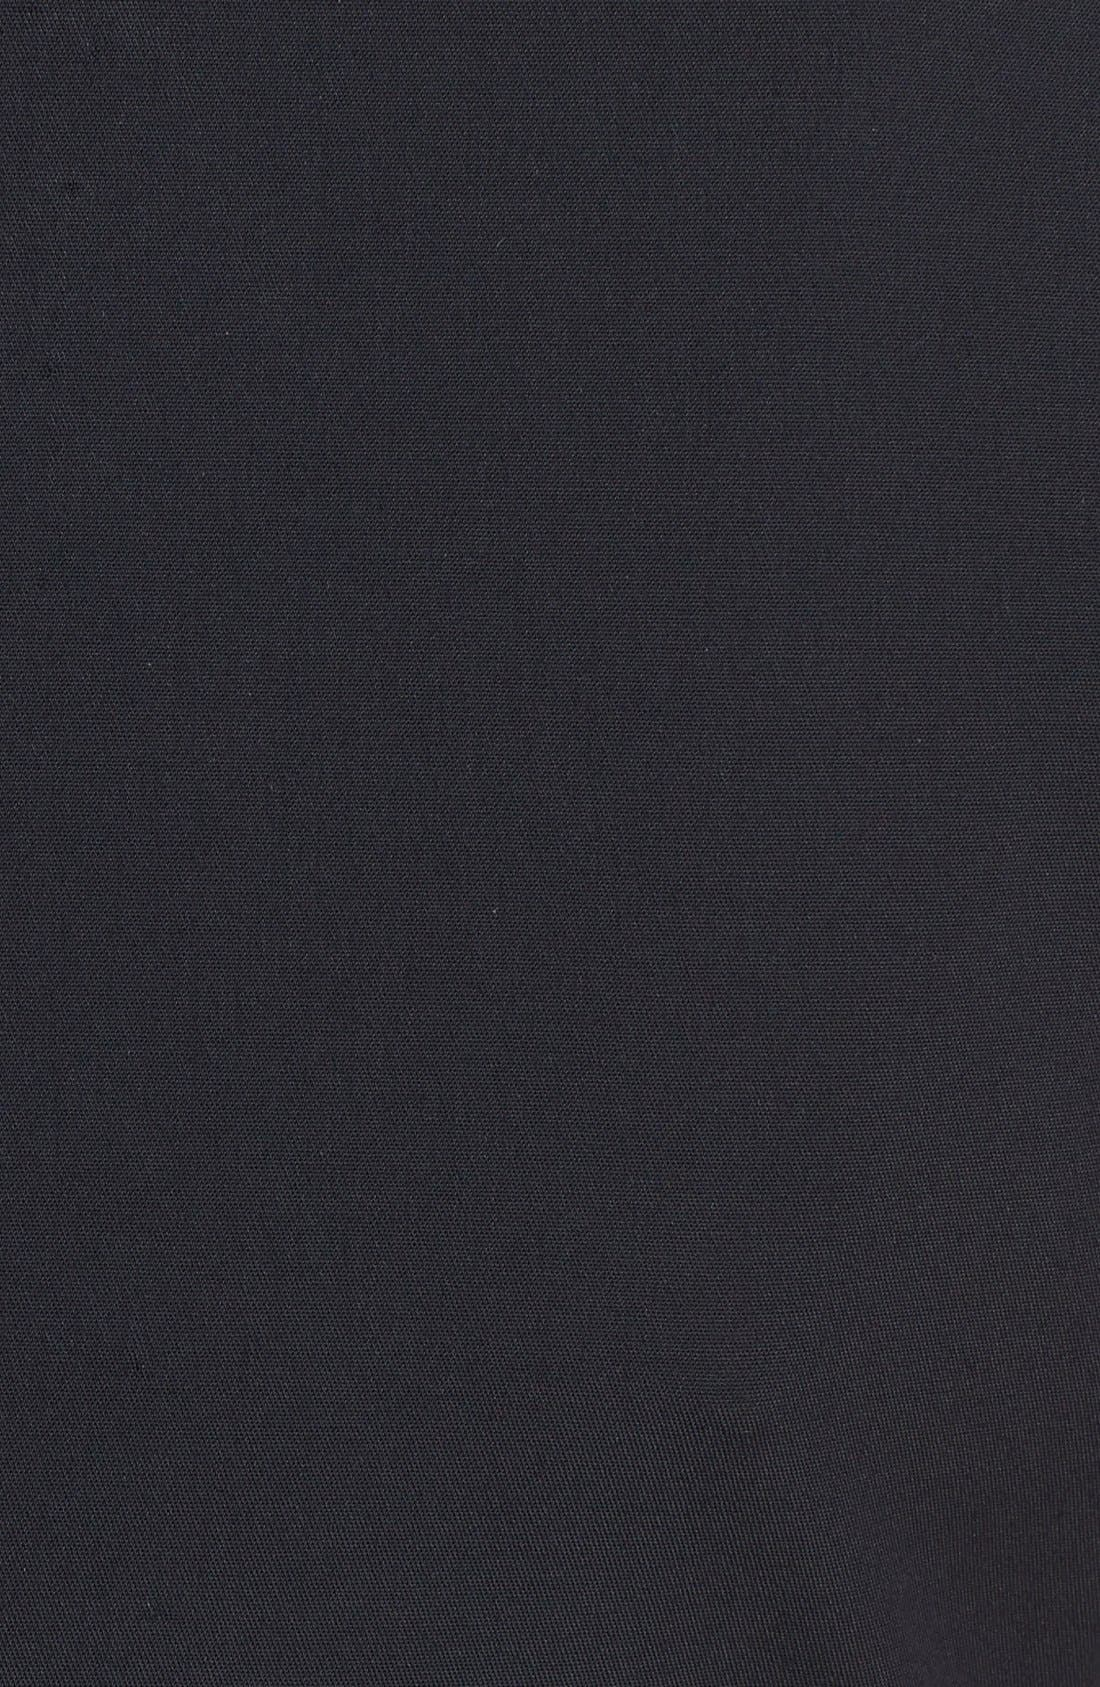 Alternate Image 3  - Lafayette 148 New York 'Zelina' Stretch Dress with Leather Trim (Regular & Petite)